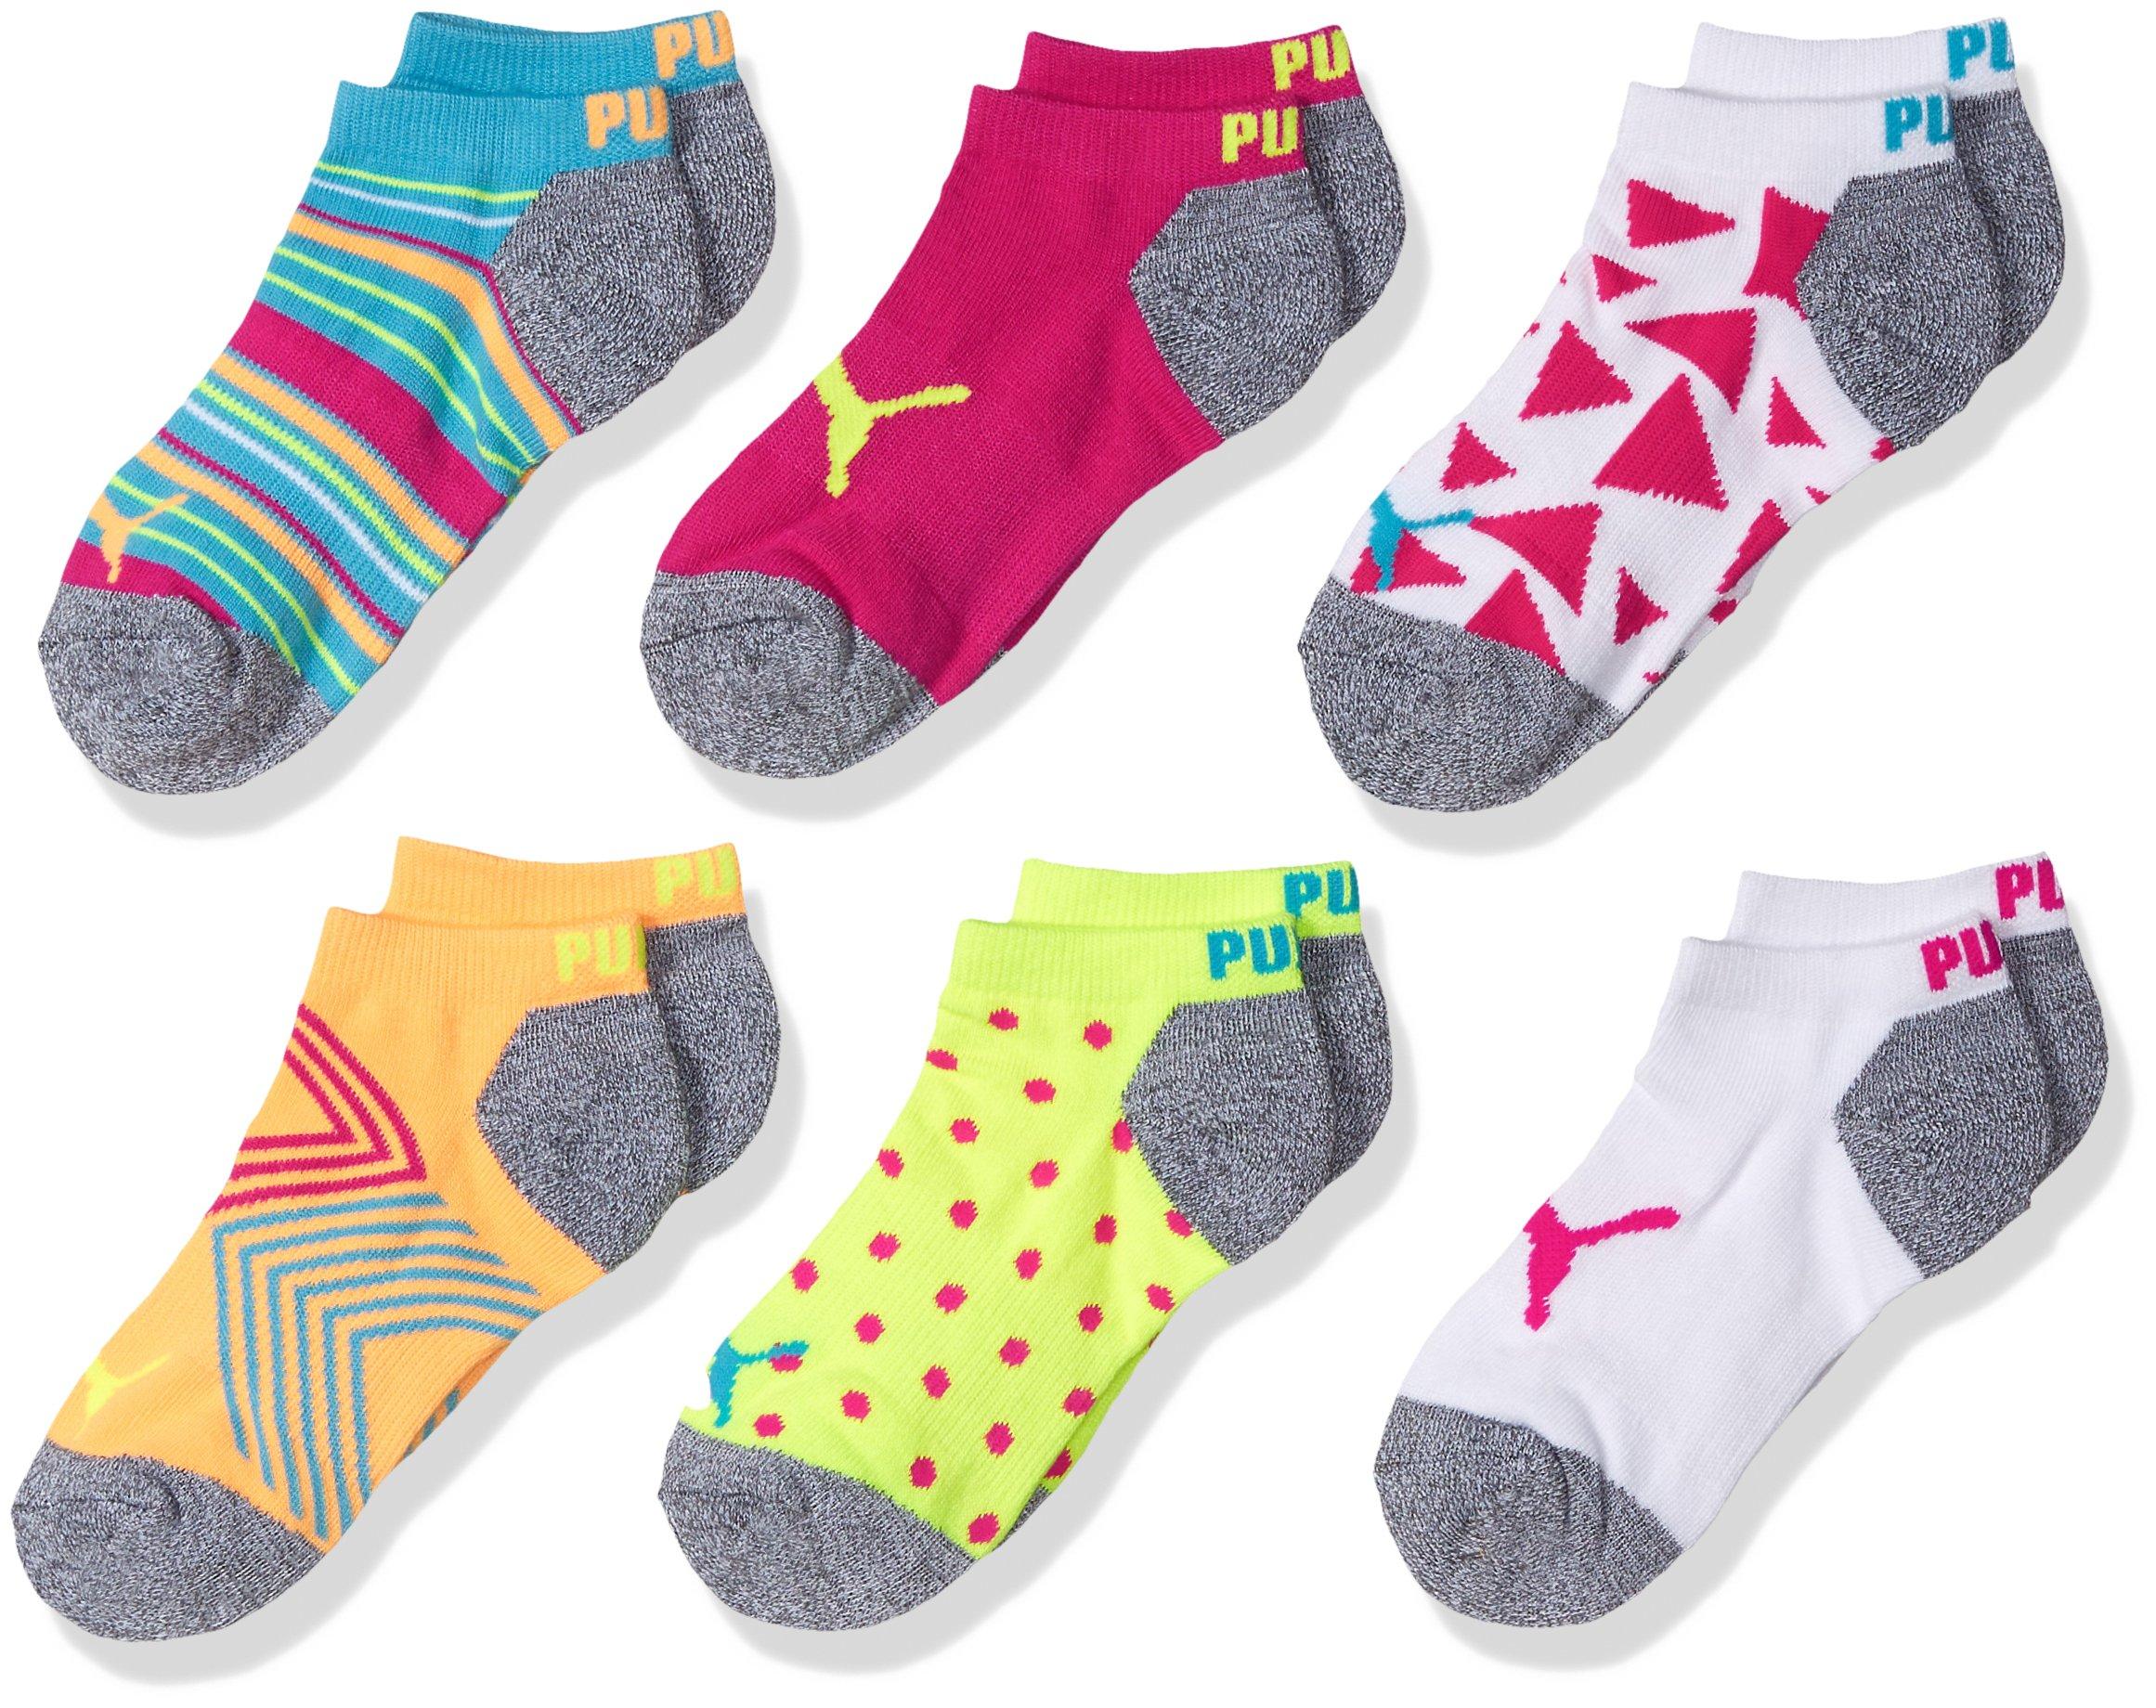 PUMA Little Girls' 6 Pack Low Cut Socks, bright yellow/multi, 7-8.5 by PUMA